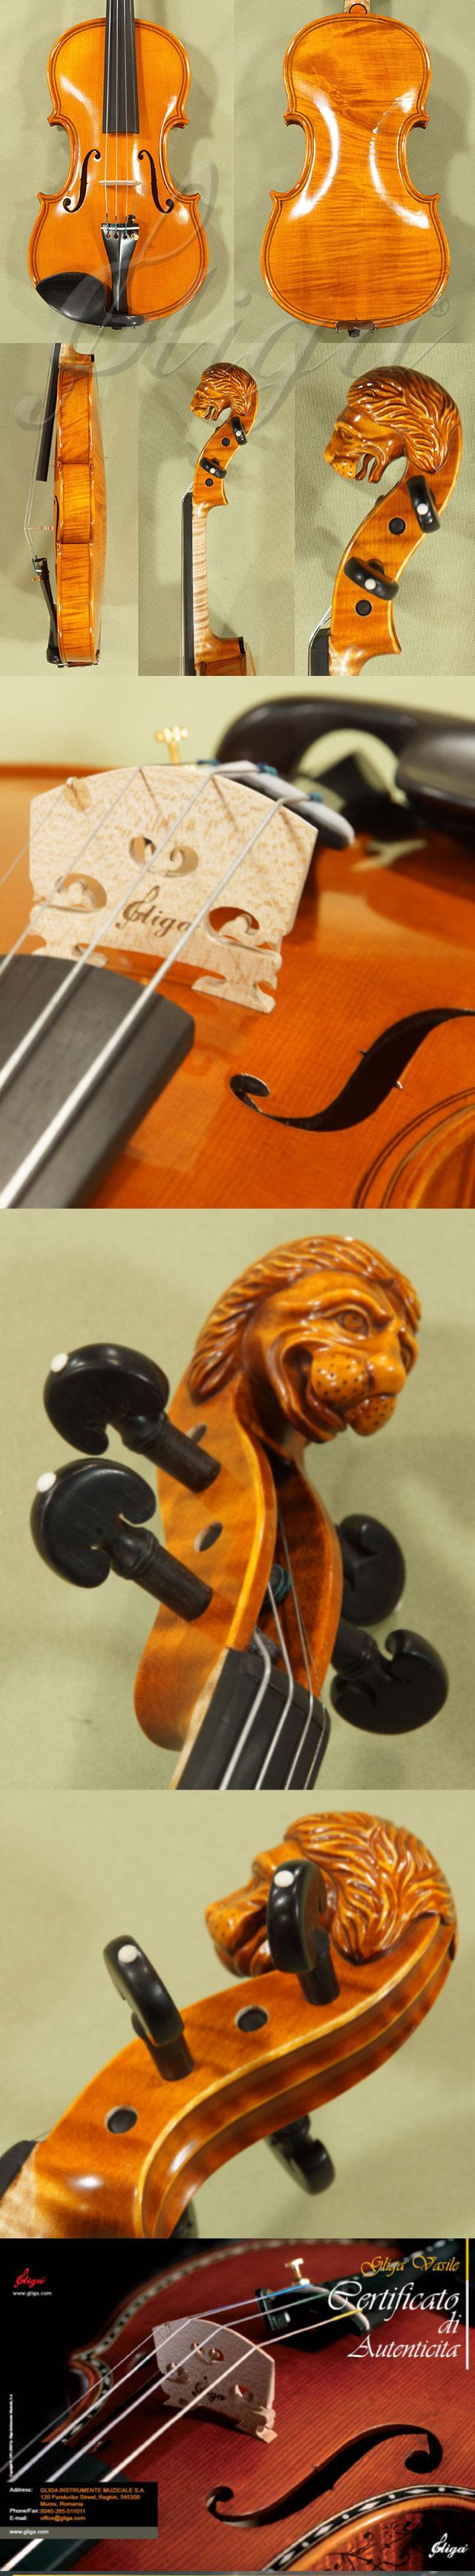 4/4 MAESTRO VASILE GLIGA Inlaid Double Purfling 'Lion' Scroll One Piece Back Violin